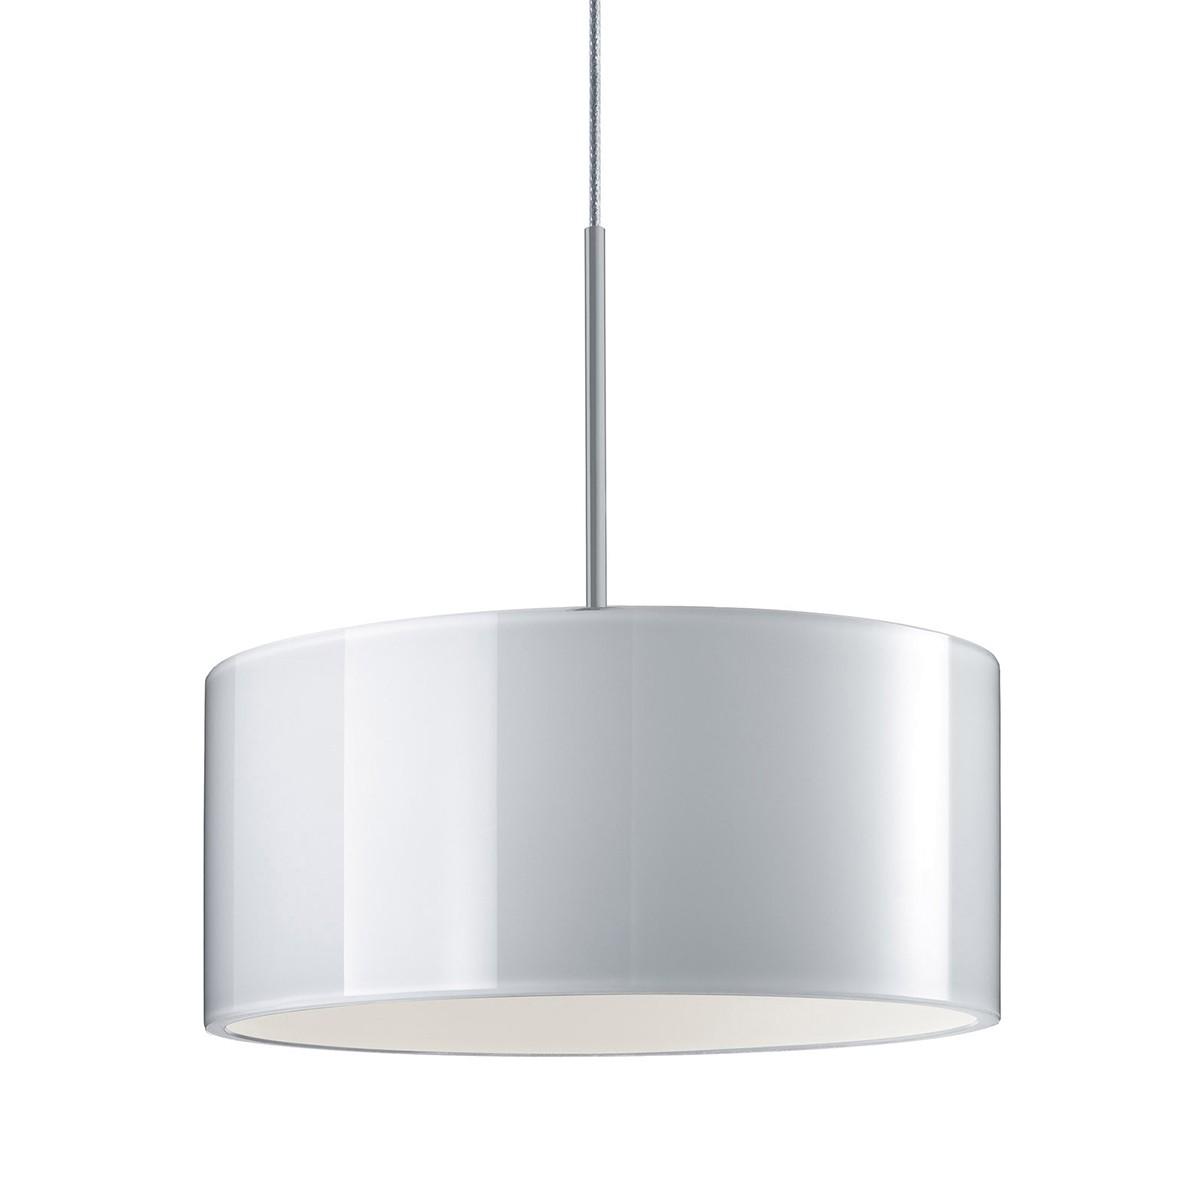 Bruck Duolare Cantara Glas Chrom matt Ø: 19 cm, LED Pendelleuchte, Glas: weiß